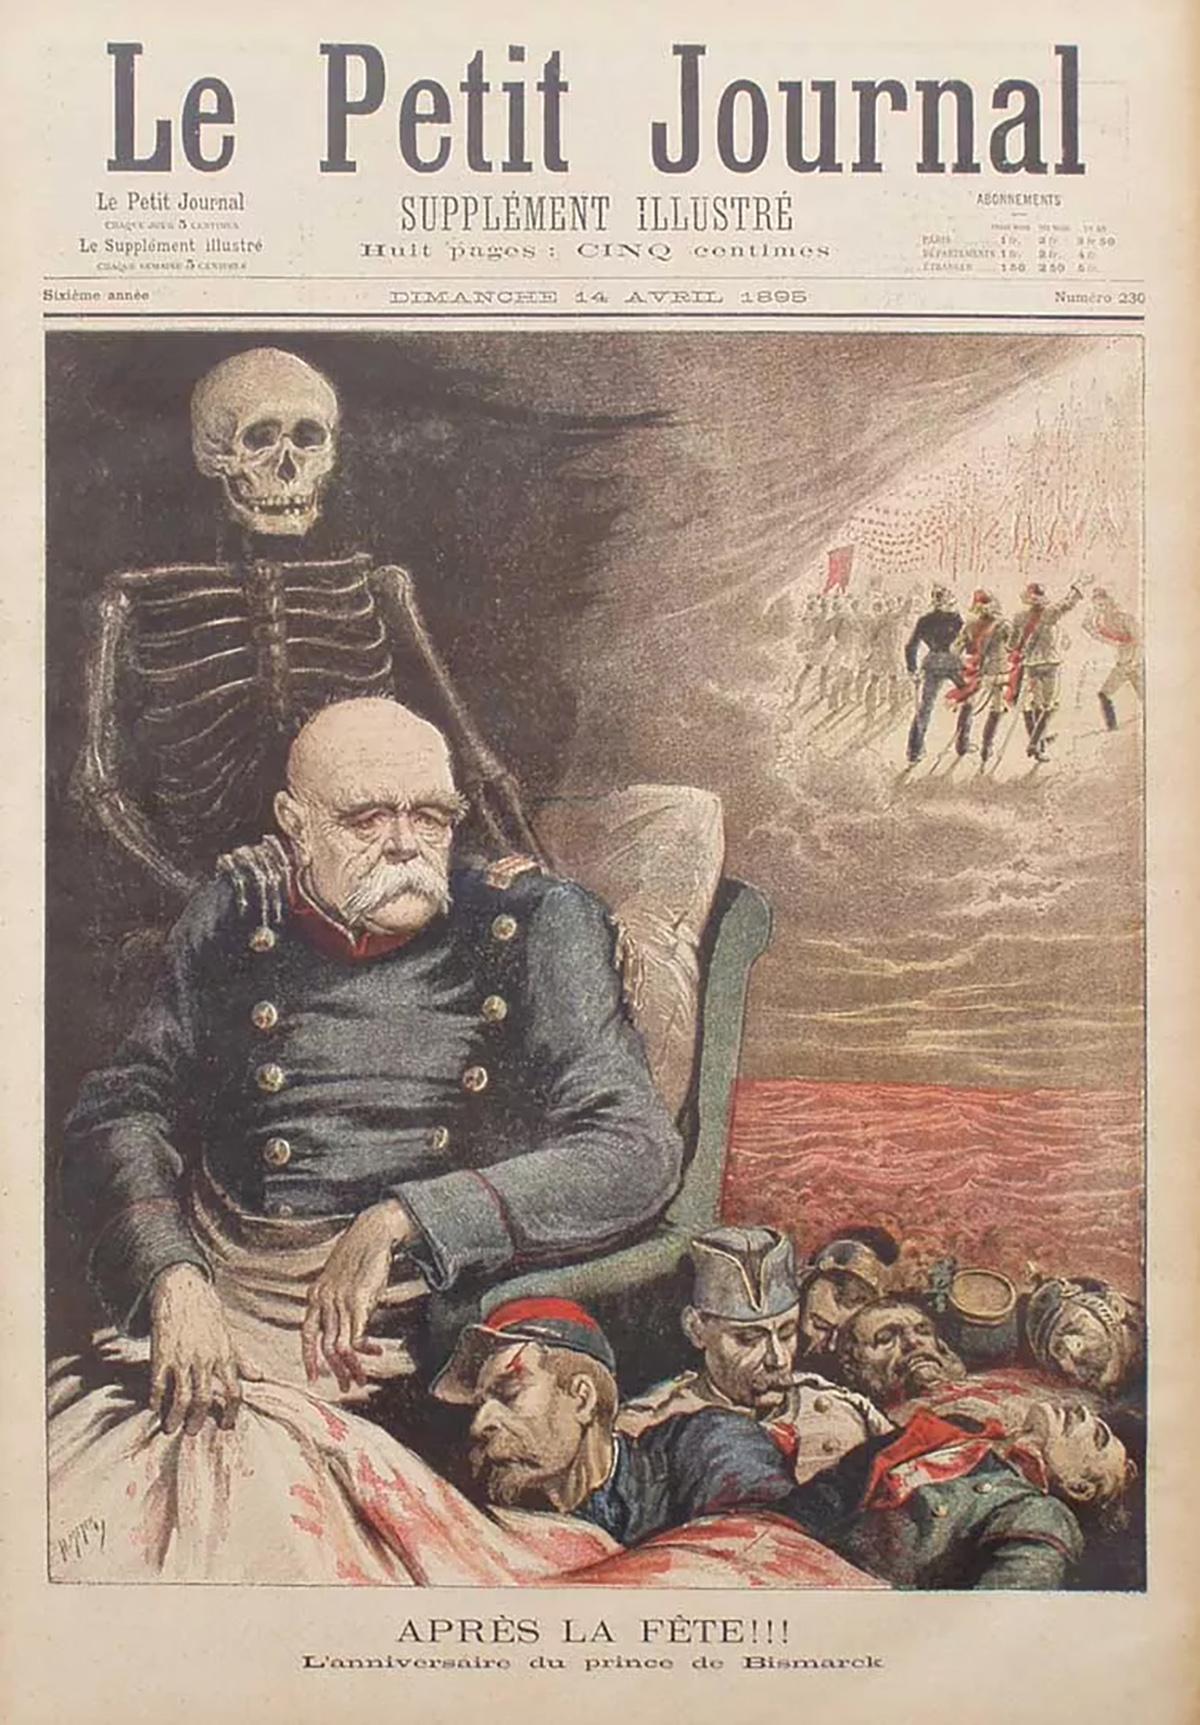 Otto von Bismarck à la Une du Petit journal Avr 1895